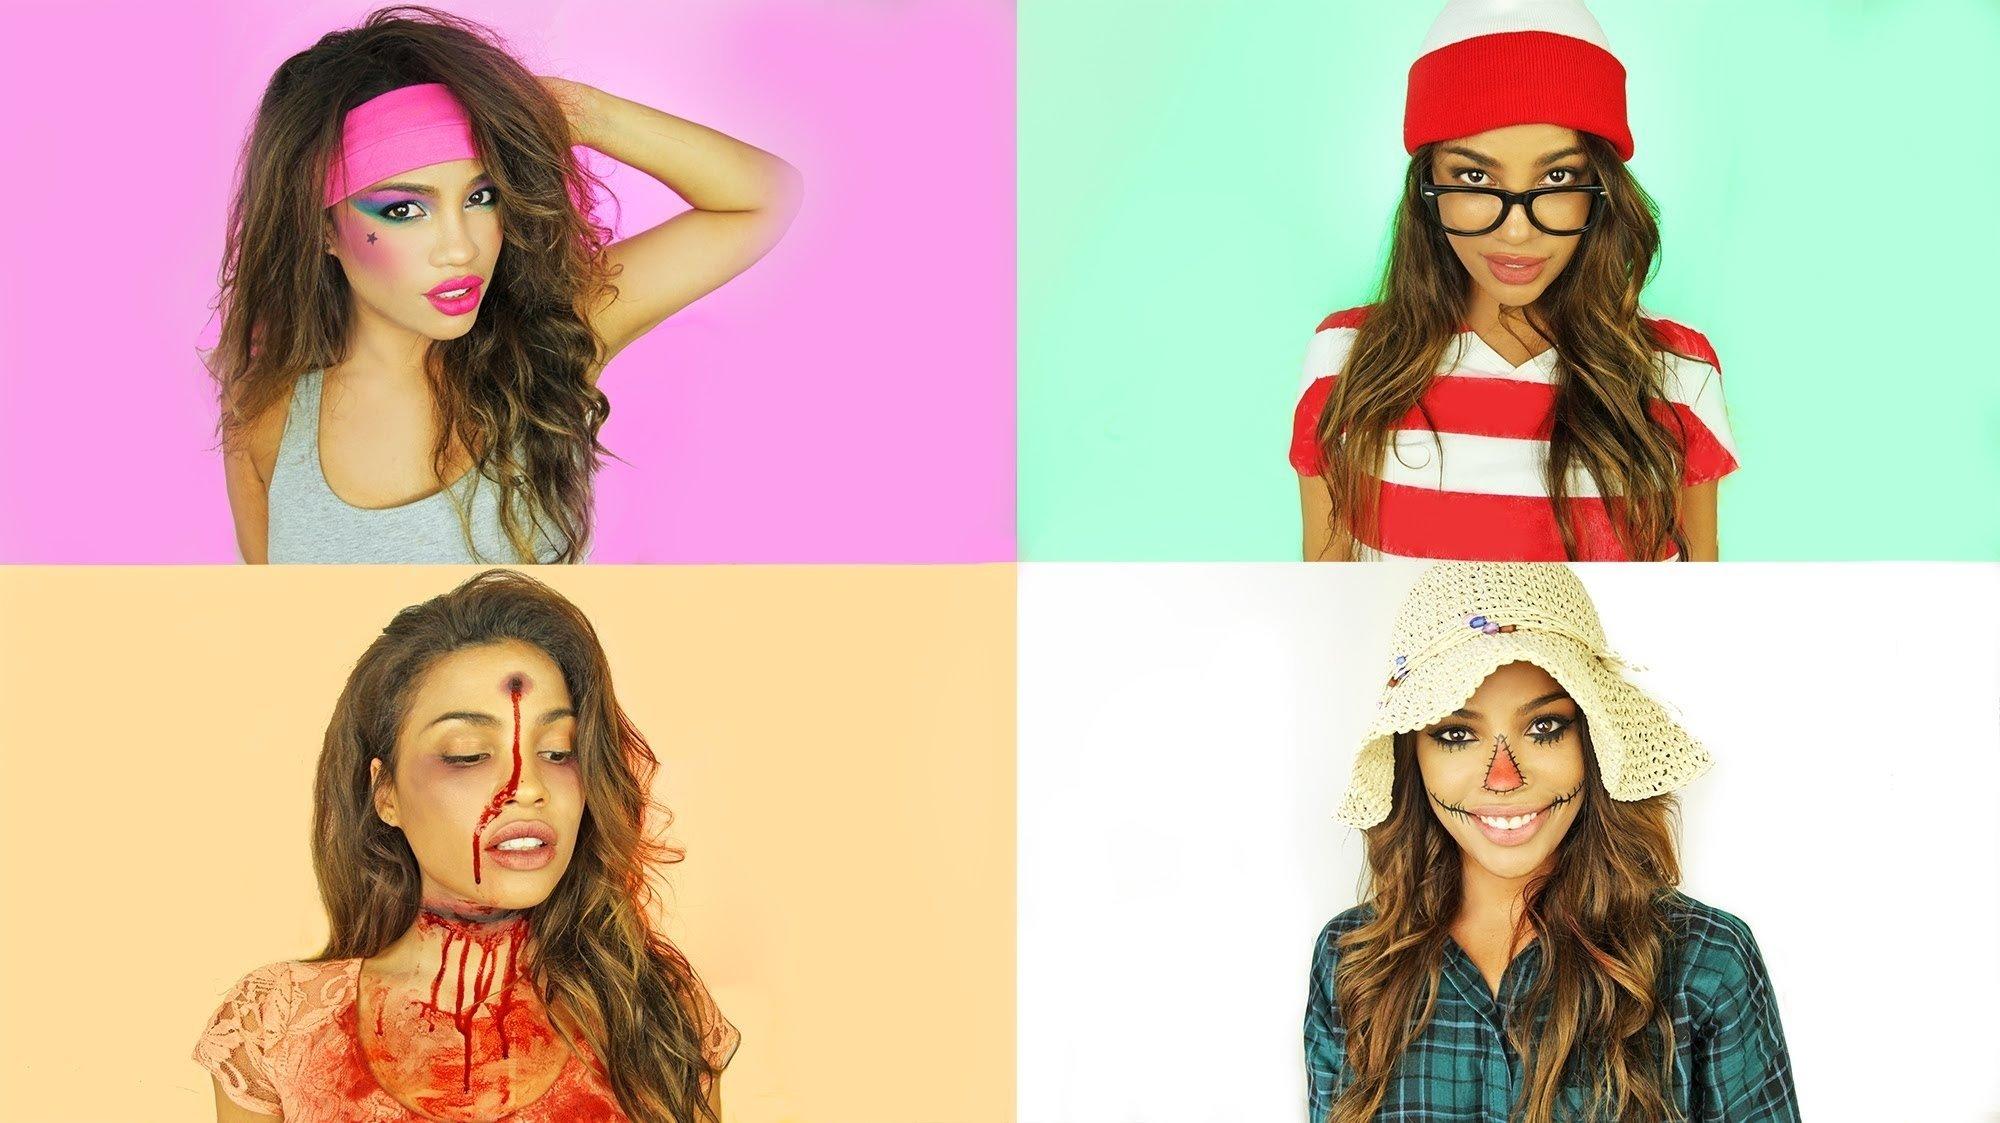 10 Awesome Creative Halloween Costume Ideas Women easy diy halloween costumes ideas andreaschoice youtube 41 2020